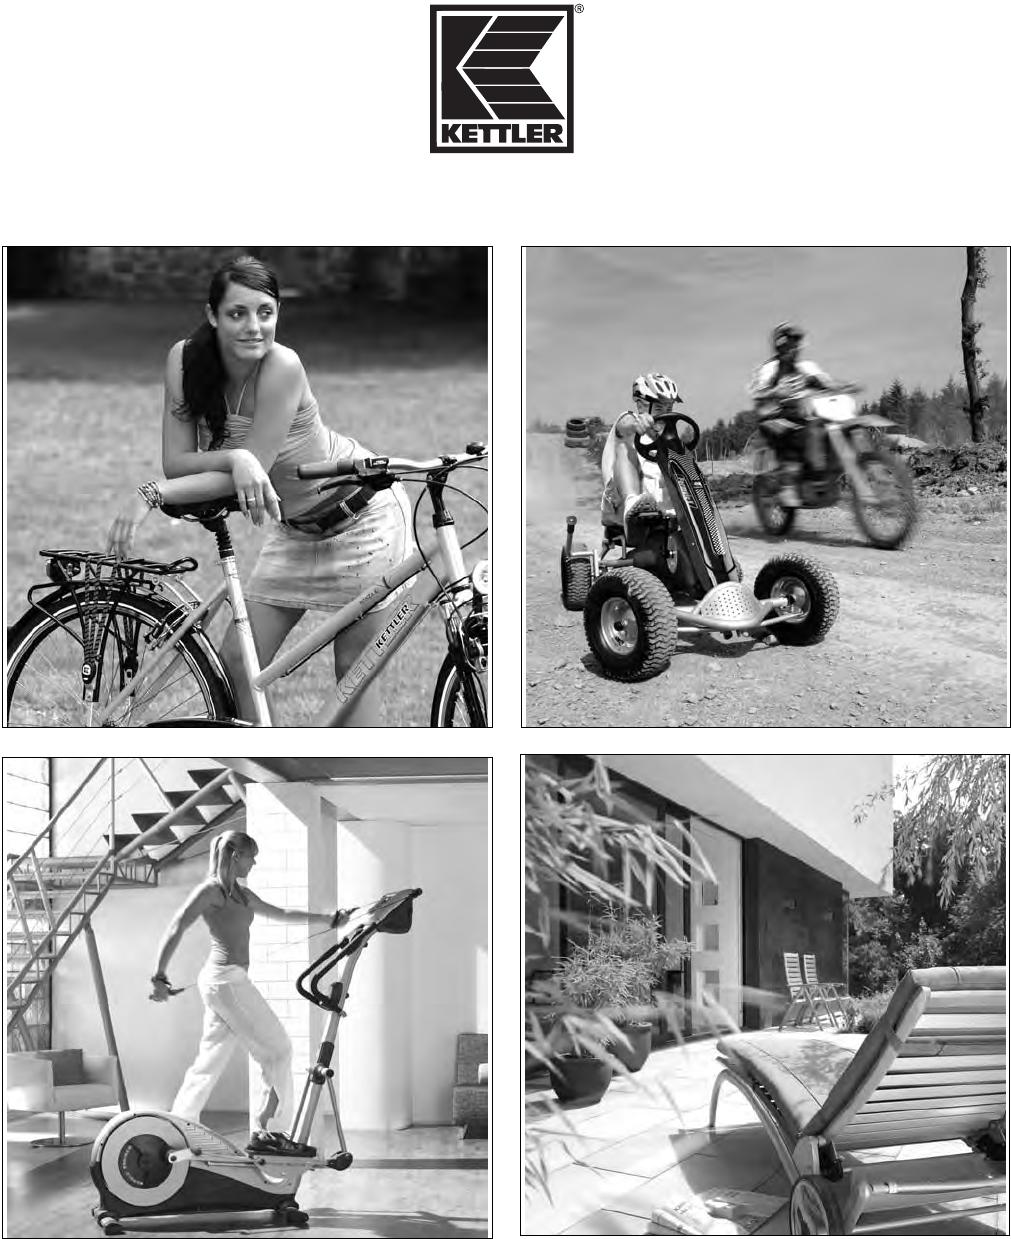 handleiding kettler 07861 700 vito ext pagina 104 van 104 dansk deutsch english espan l. Black Bedroom Furniture Sets. Home Design Ideas